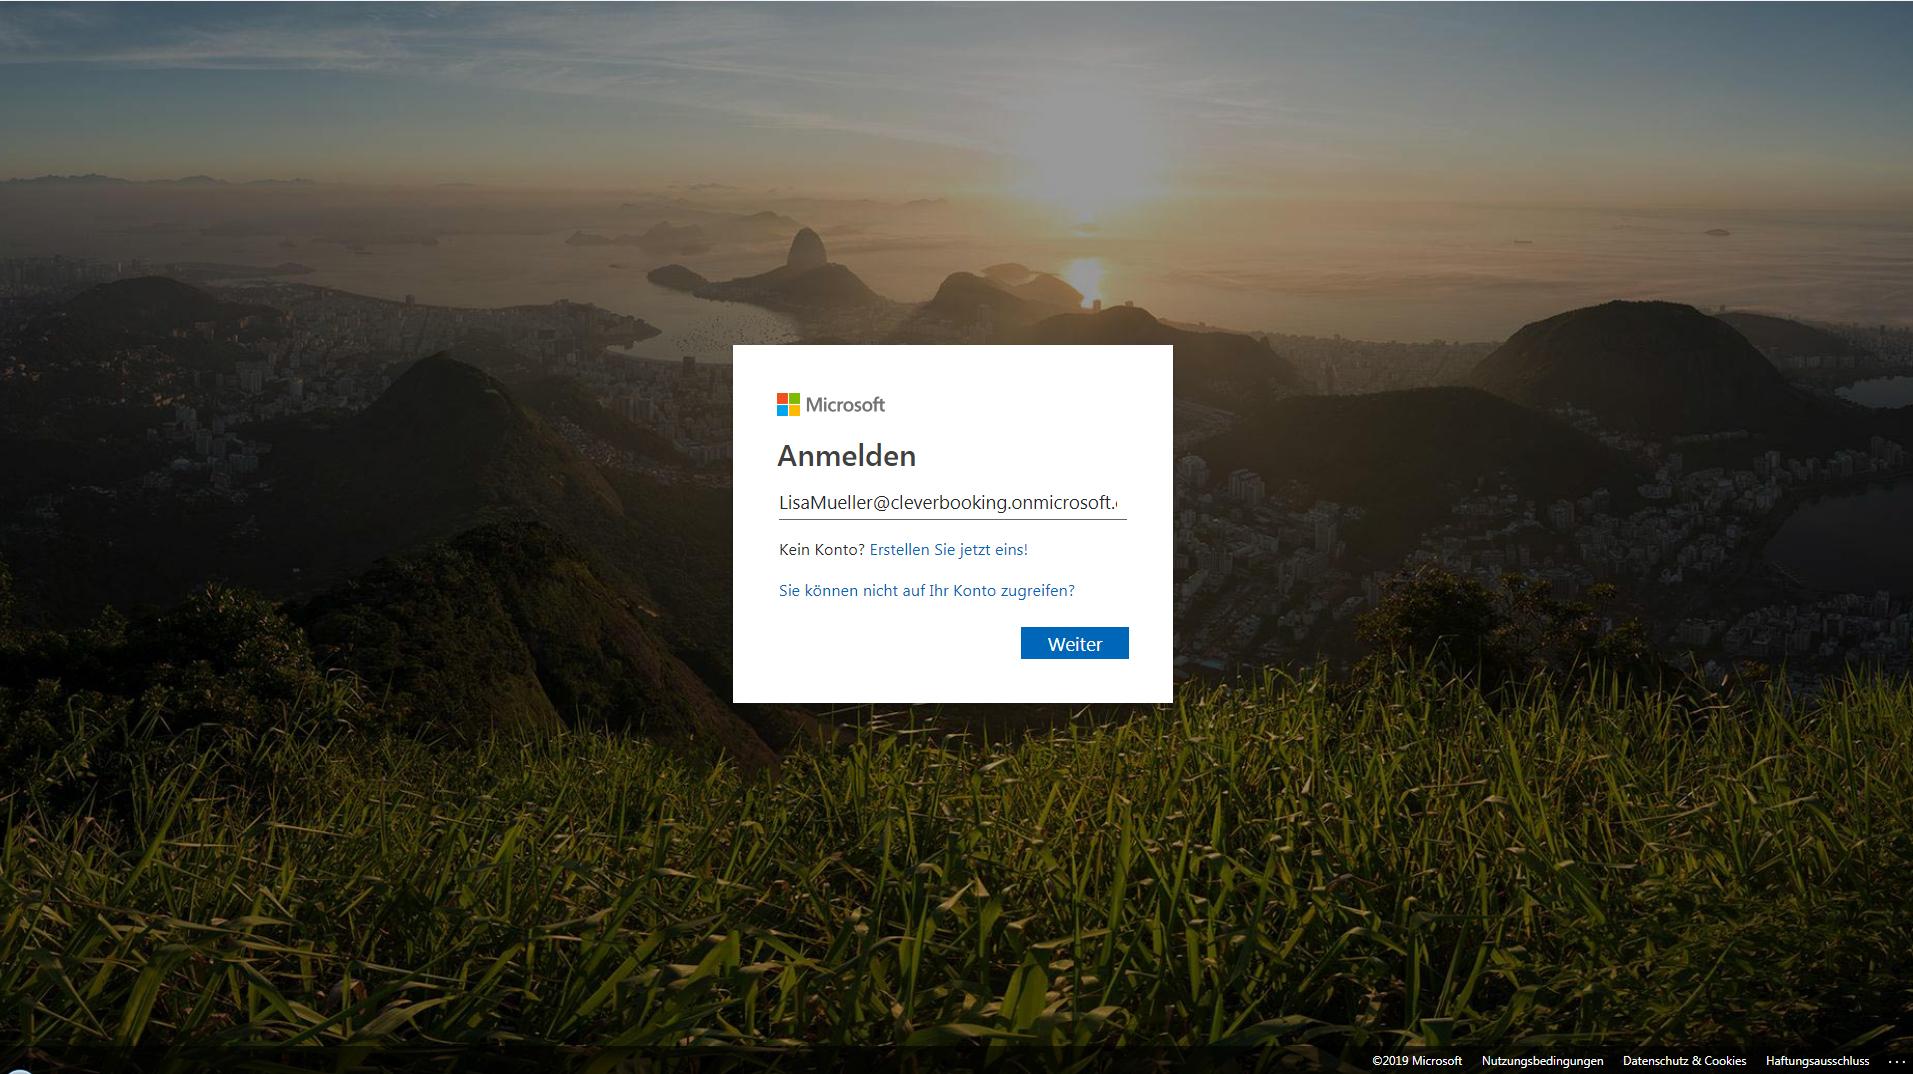 3. Dokumentenexport: Verknüpfung zu OneDrive erstellen